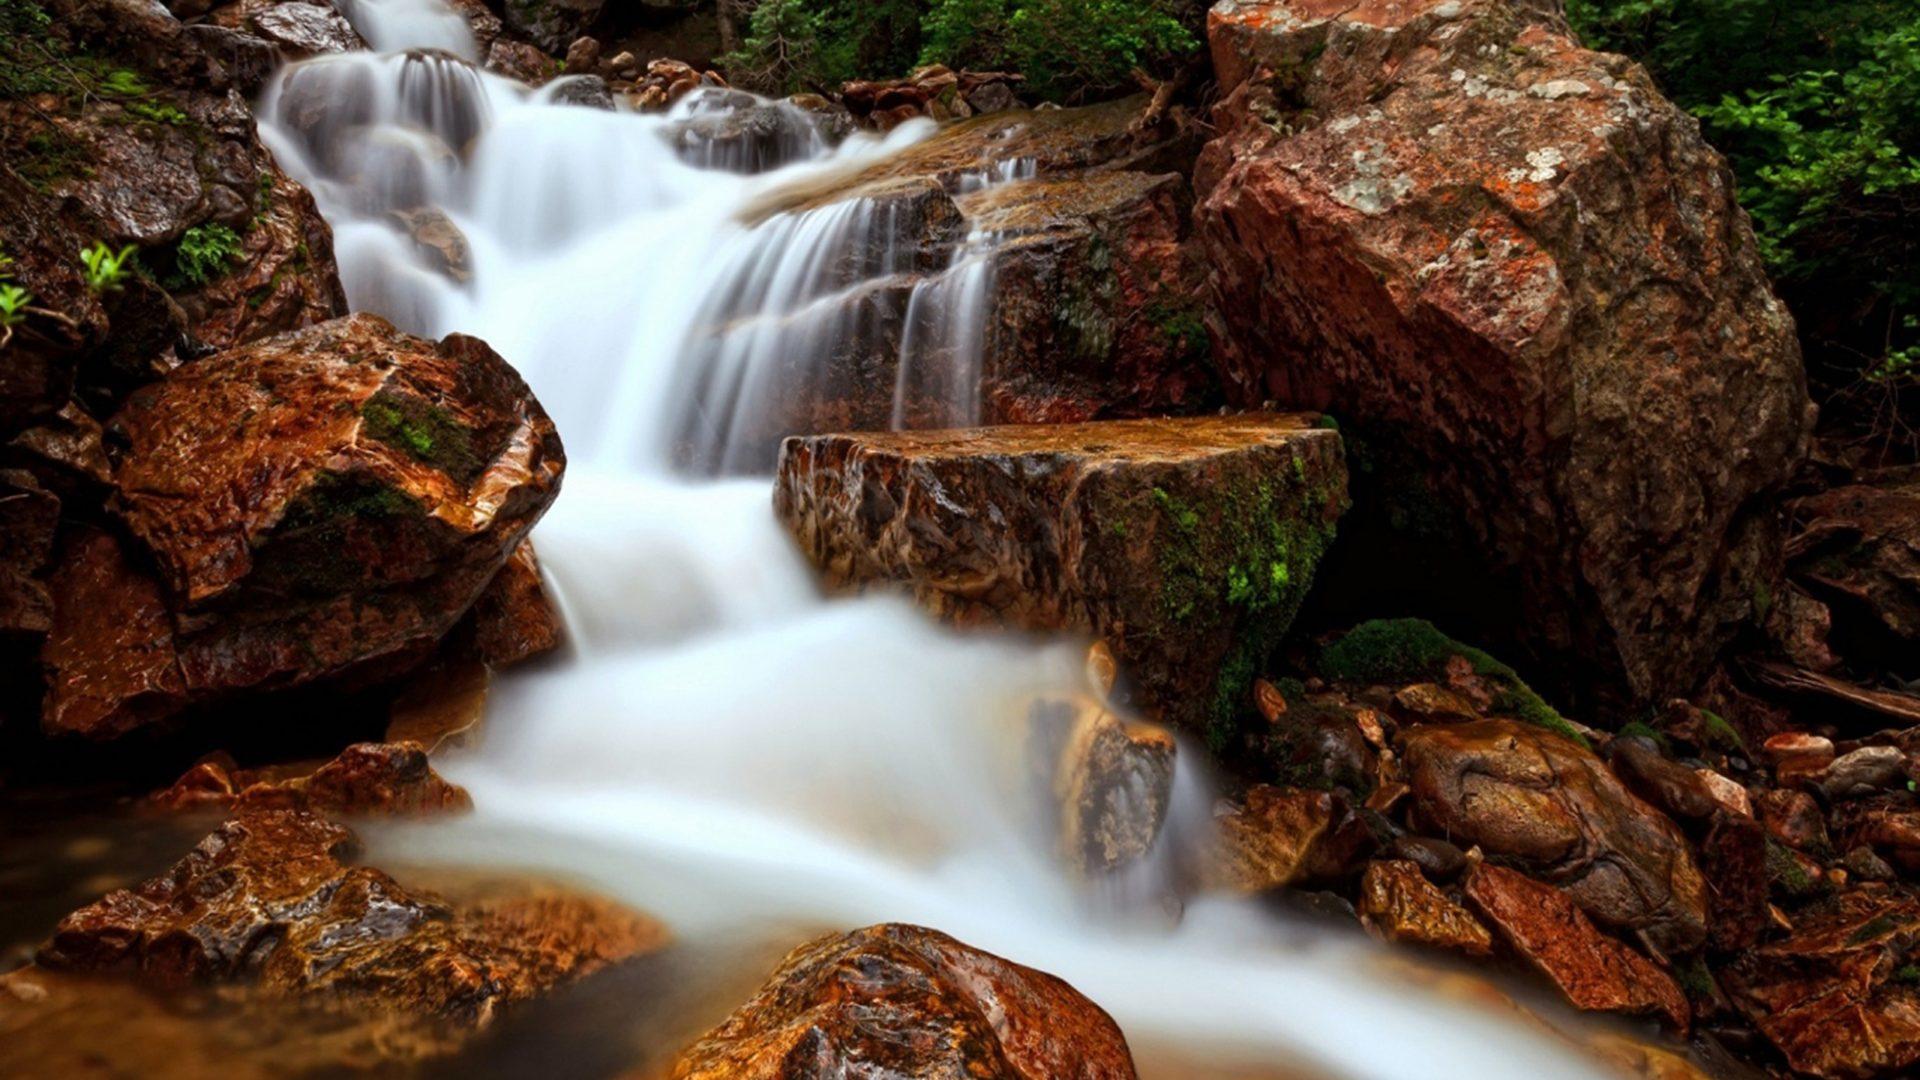 Nature Wallpaper Autumn Fall 1600x1200 Waterfall Flow Water Rock Beautiful Hd Wallpaper